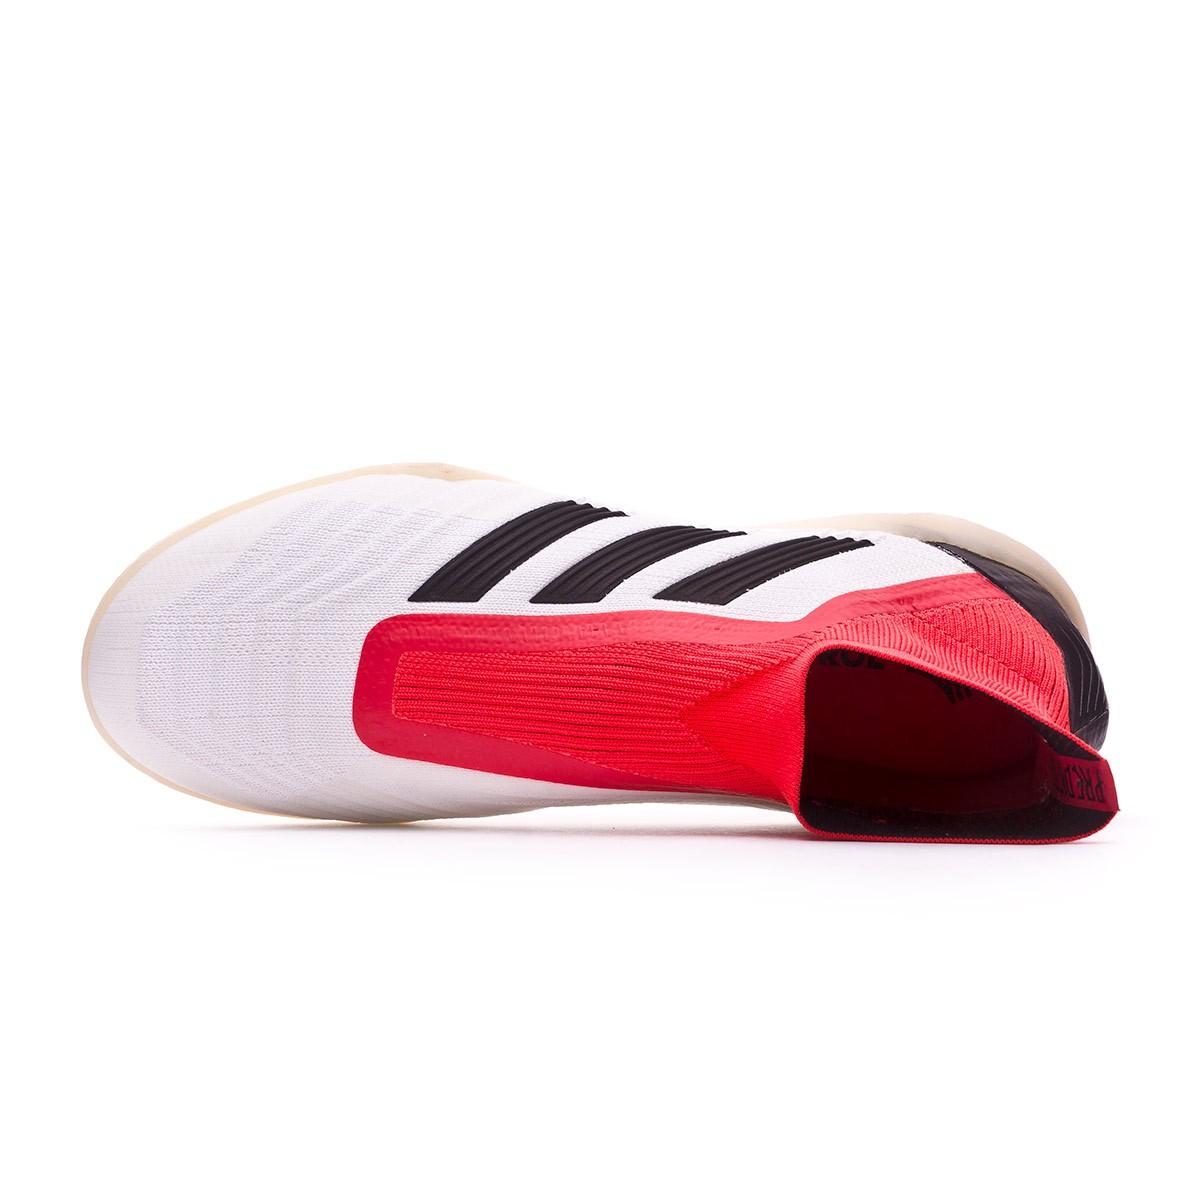 fa48bbb9 Tenis adidas Predator Tango 18+ IN White-Core black-Real coral - Tienda de  fútbol Fútbol Emotion